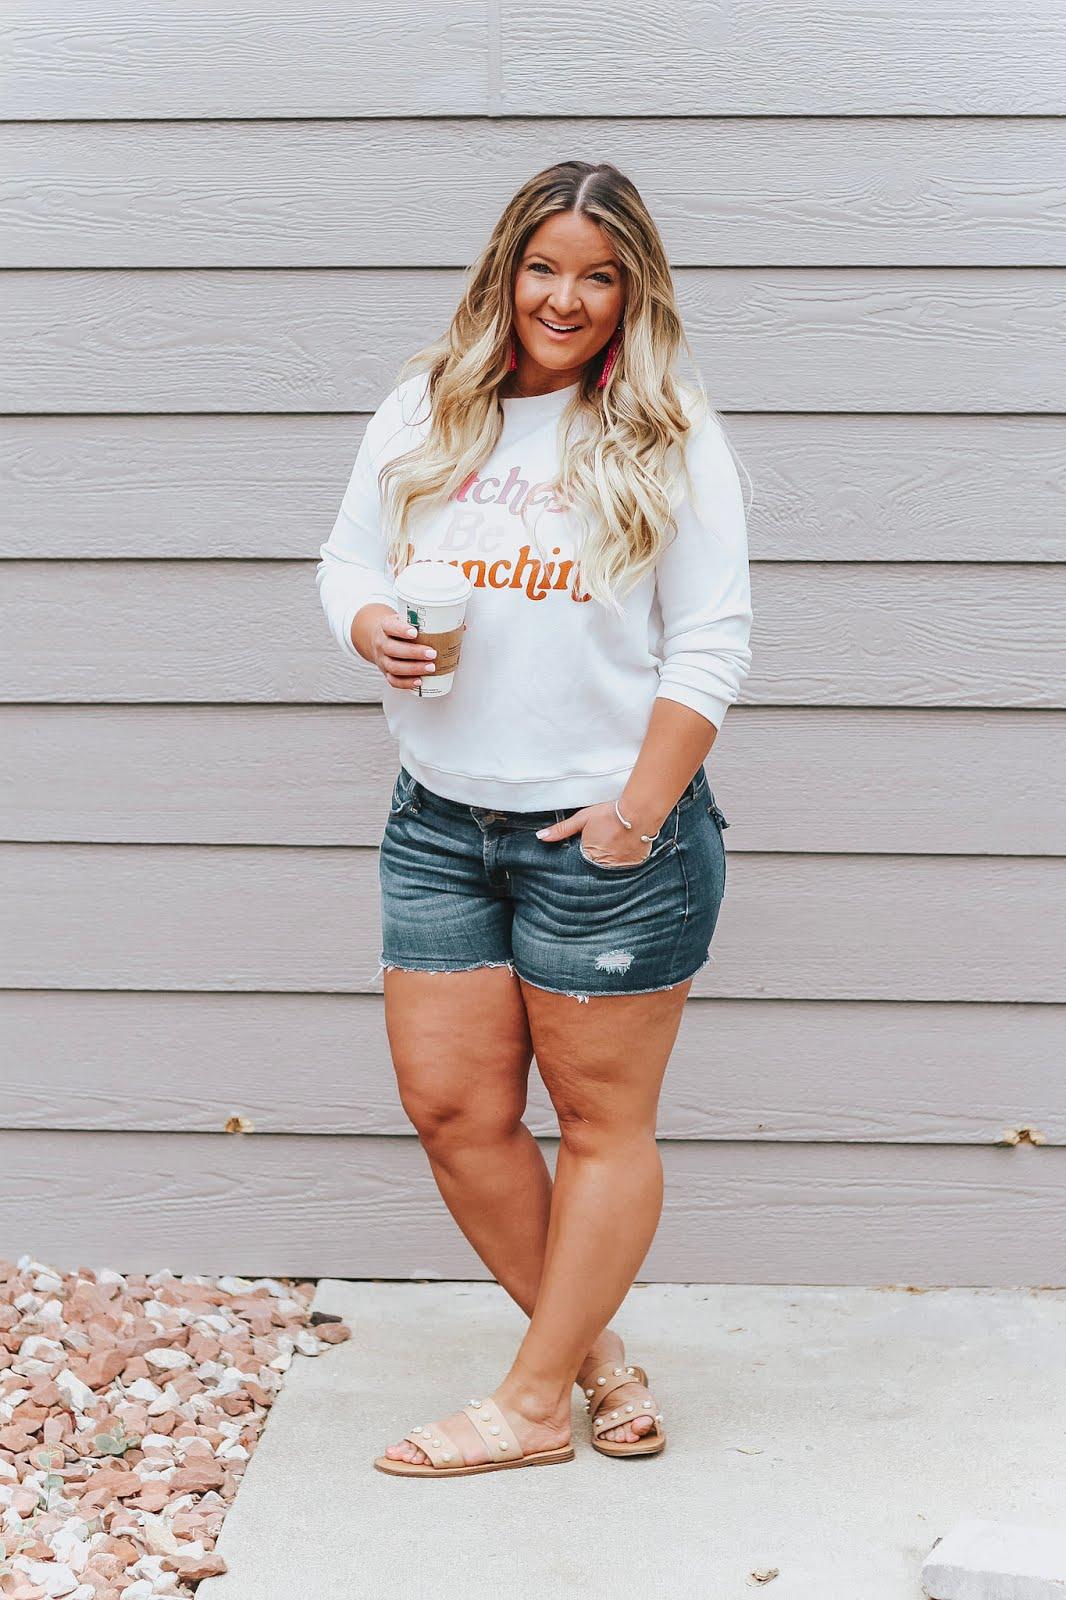 Bitches who brunch sweater styled on top Denver fashion blog, Delayna Denaye